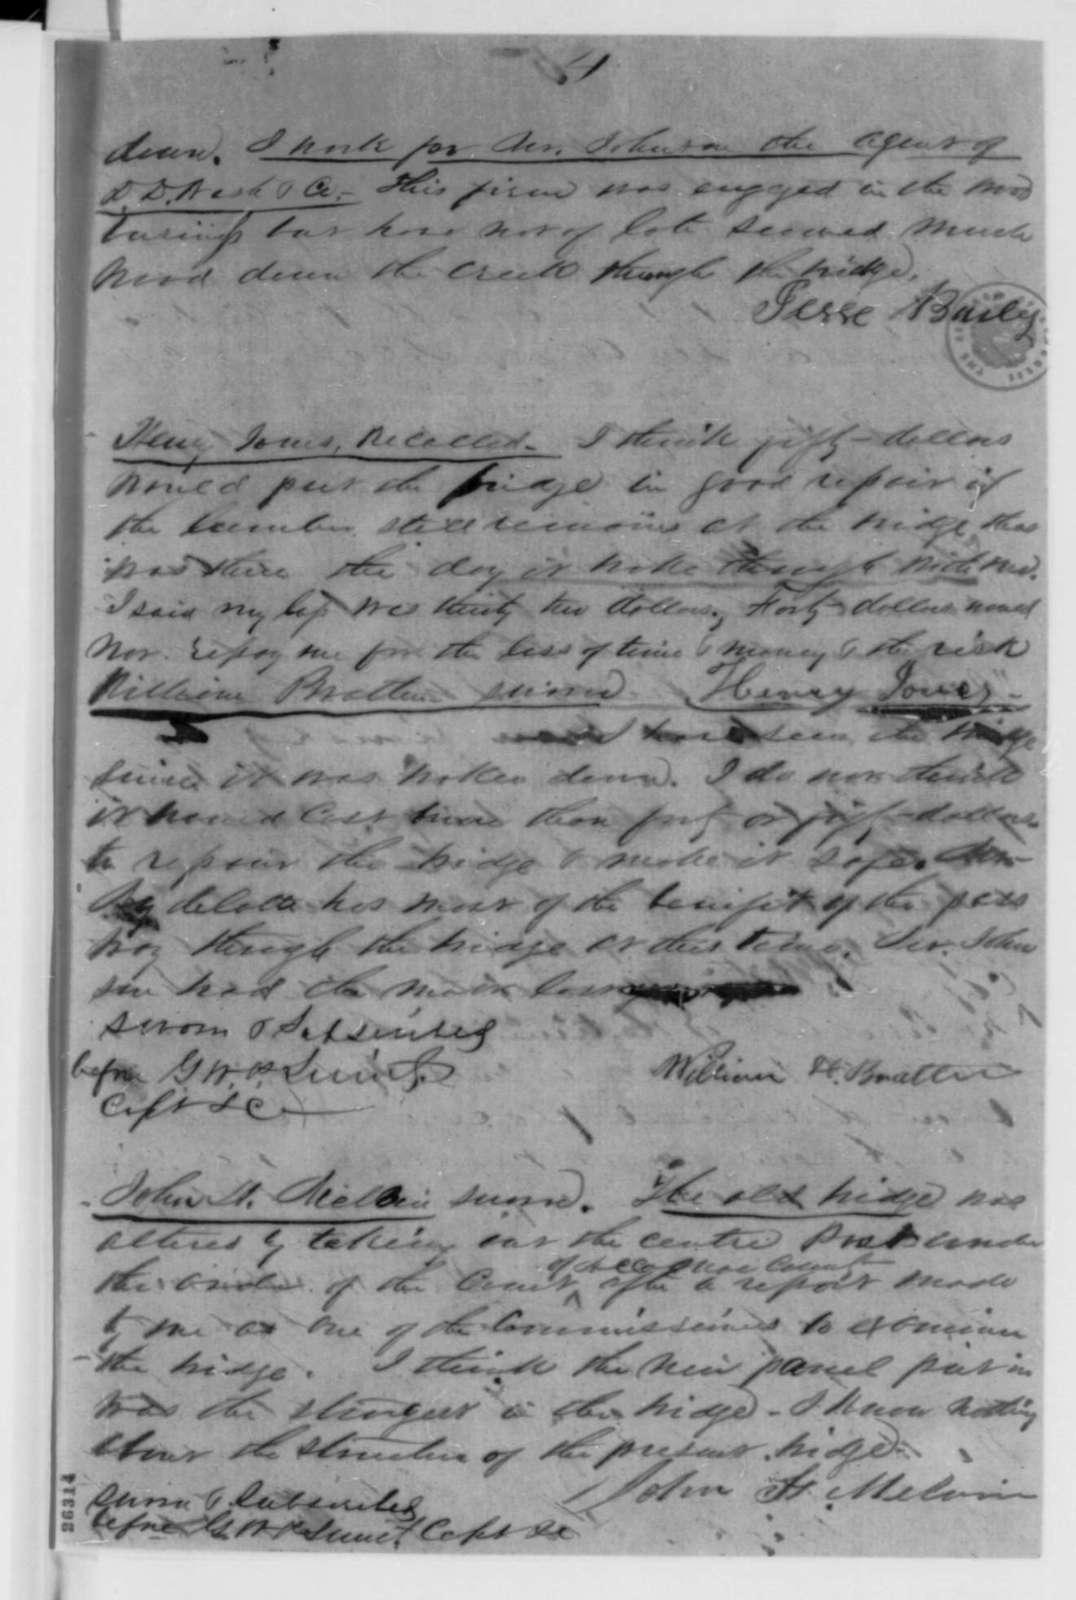 G. W. P. Smith, Wednesday, September 16, 1863  (Report and affidavits concerning Swan's Gut Bridge; endorsed by John E. Graham)